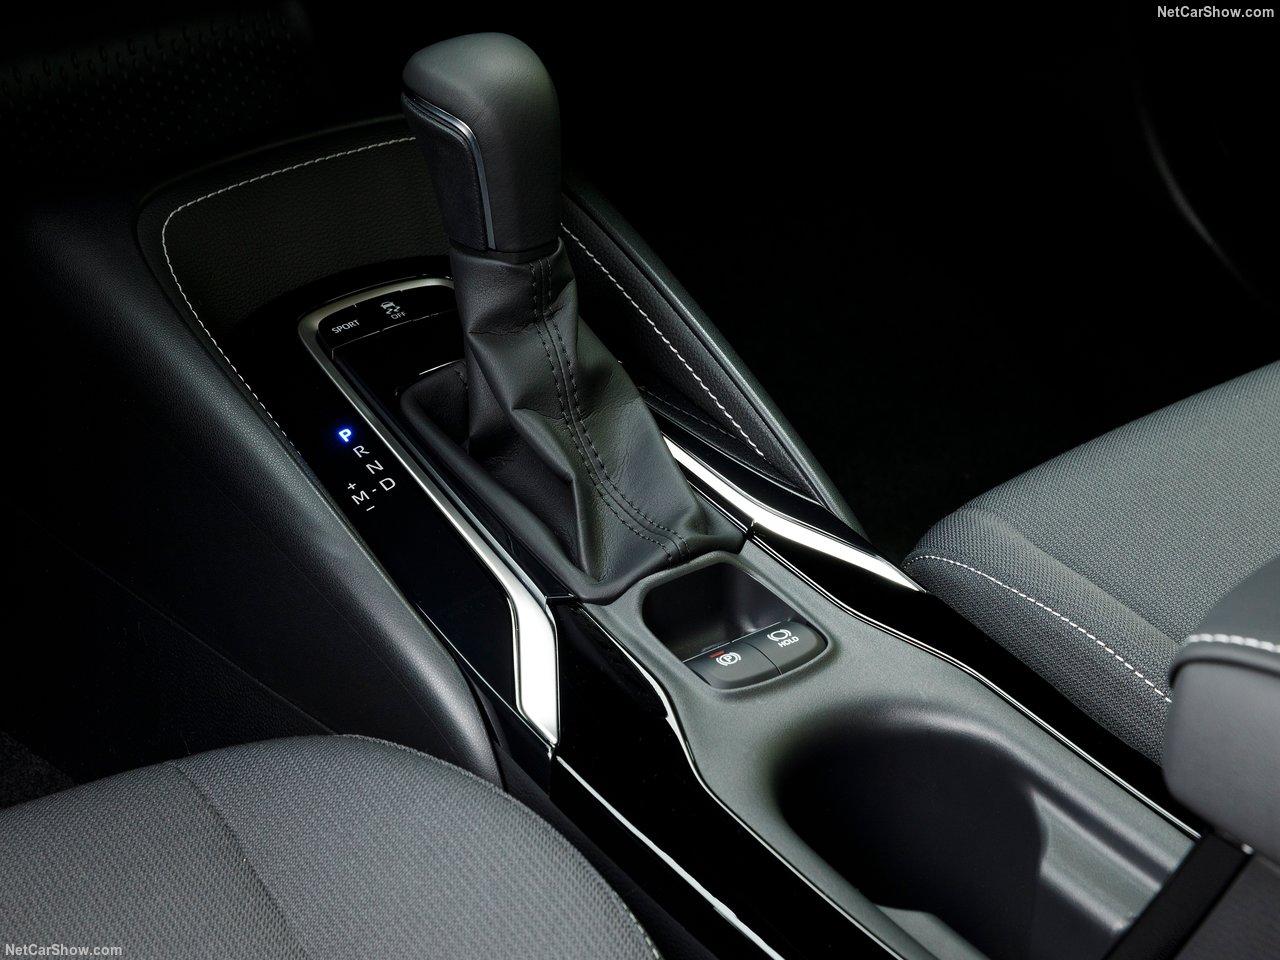 Toyota-Corolla_Hatchback-2019-1280-3d_20180530085909cda.jpg